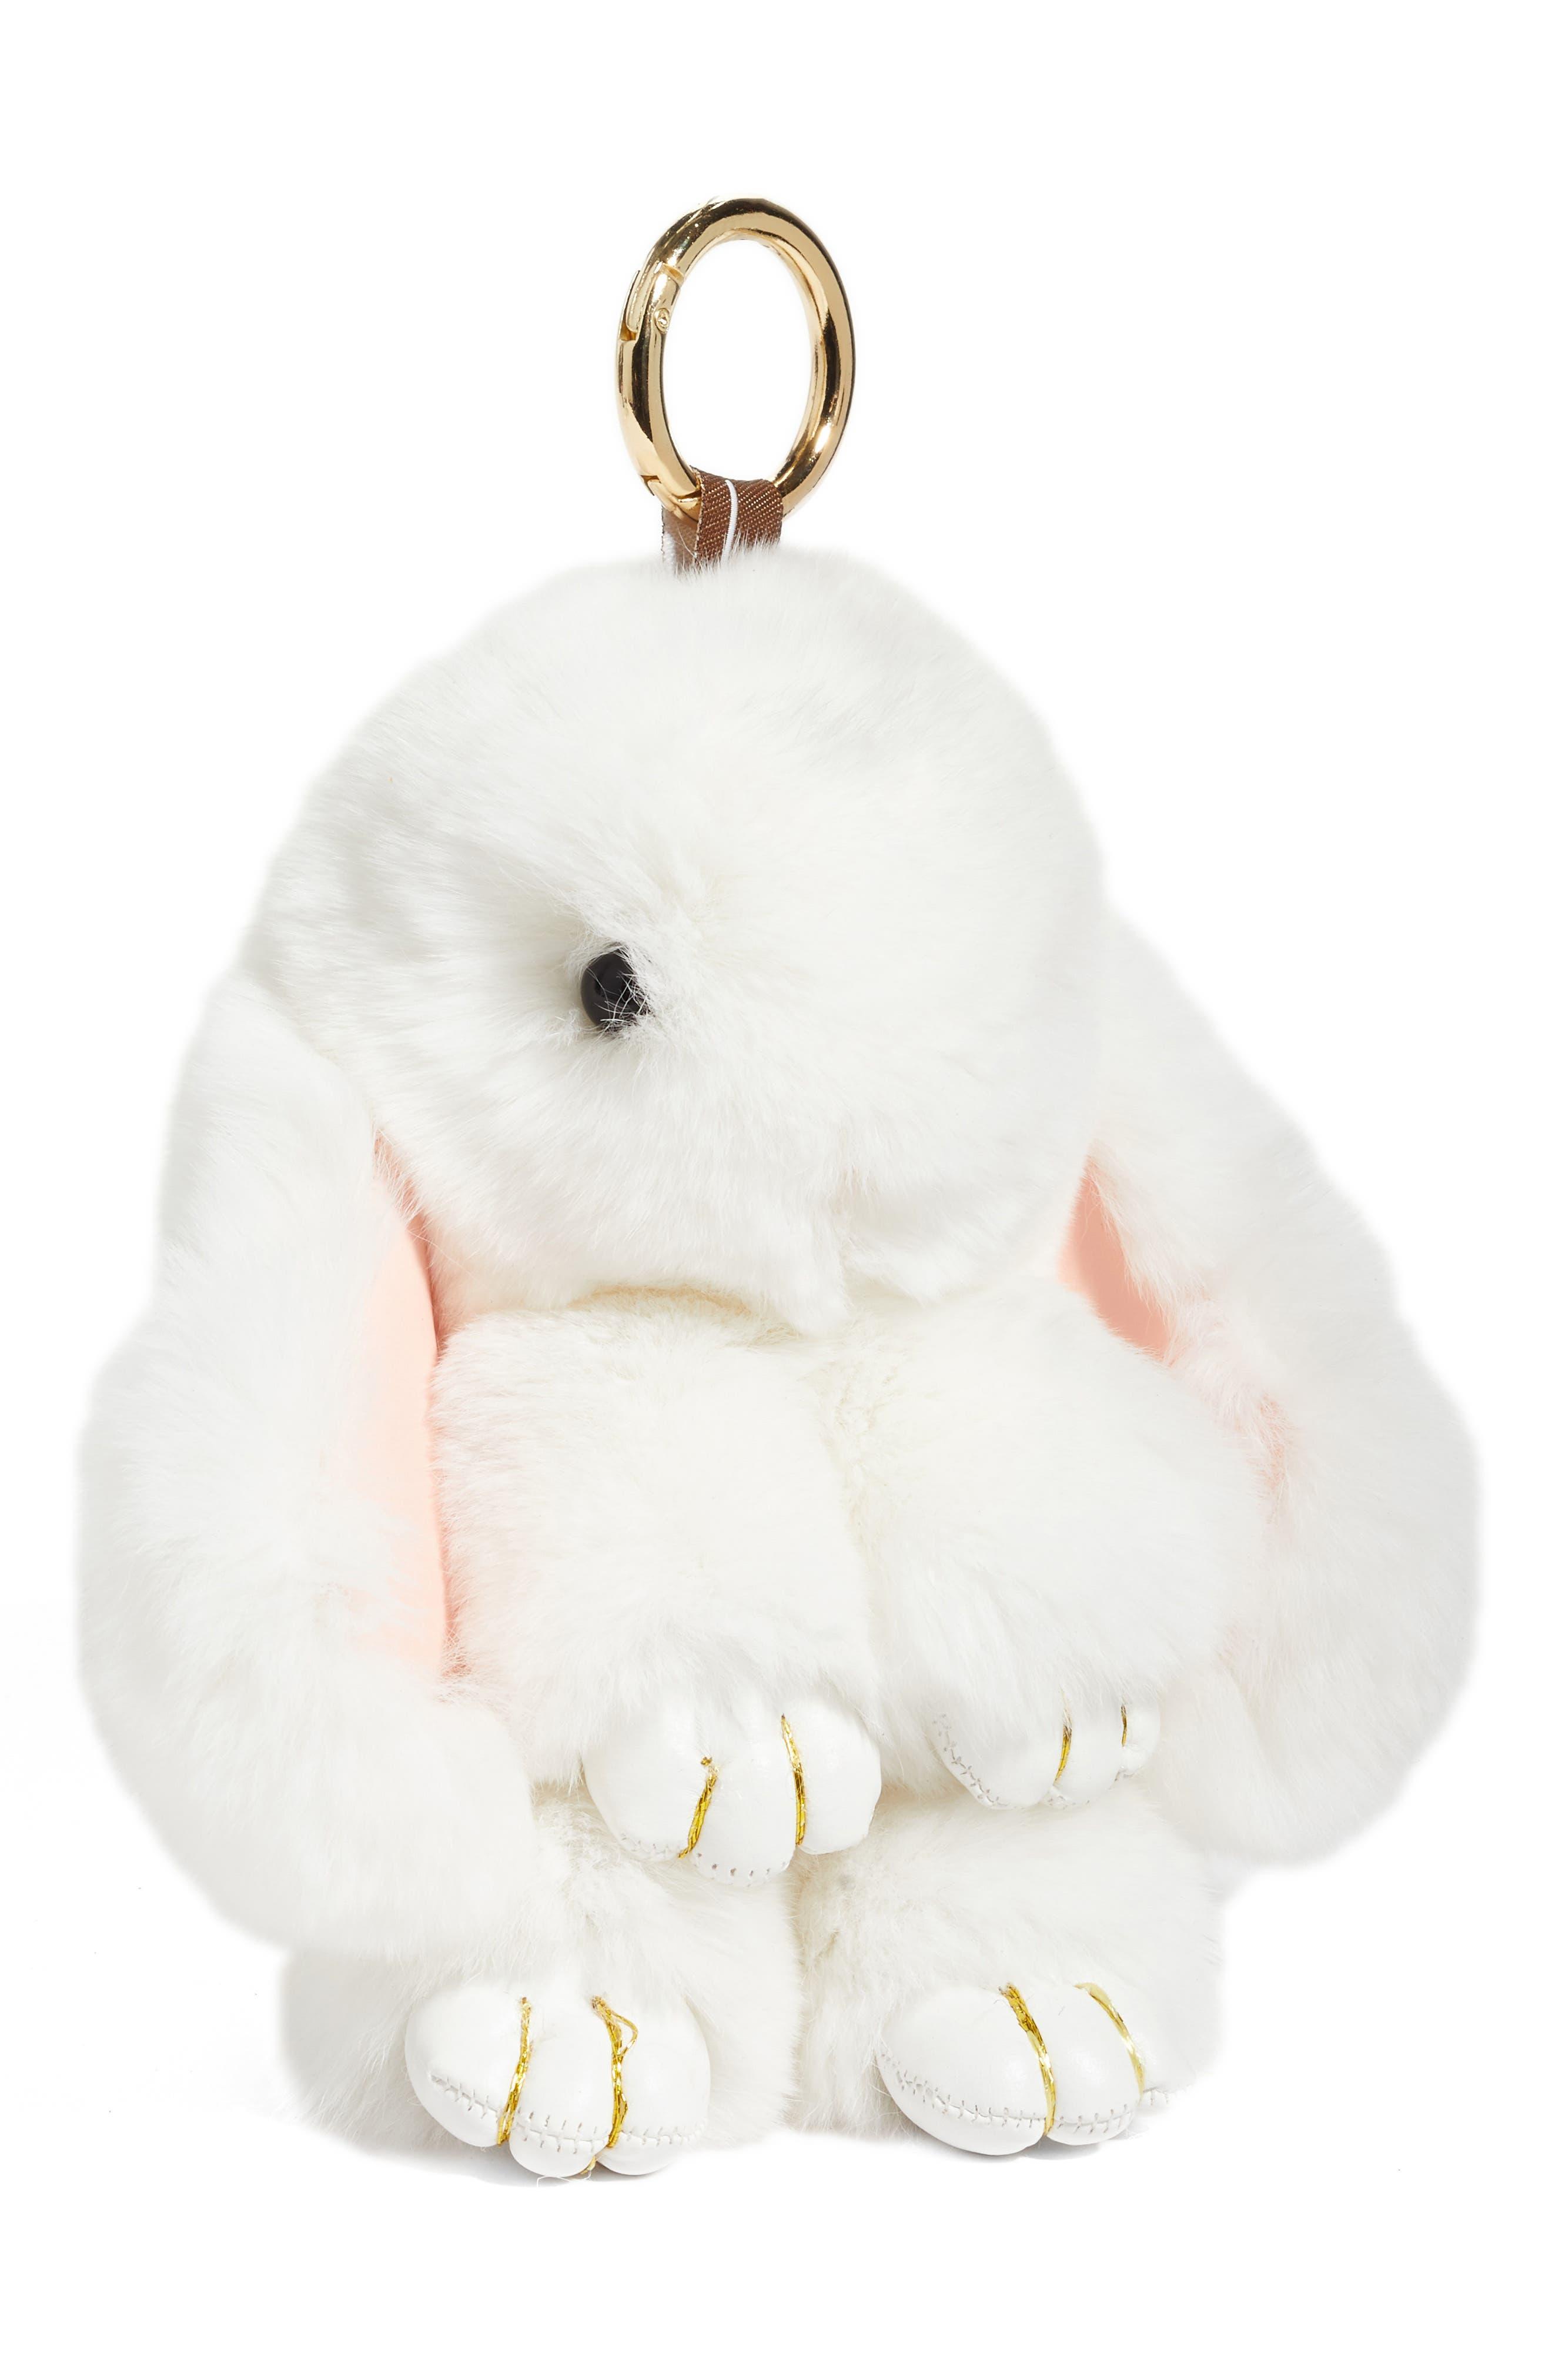 Alternate Image 1 Selected - Natasha Couture Genuine Rabbit Fur Bag Charm